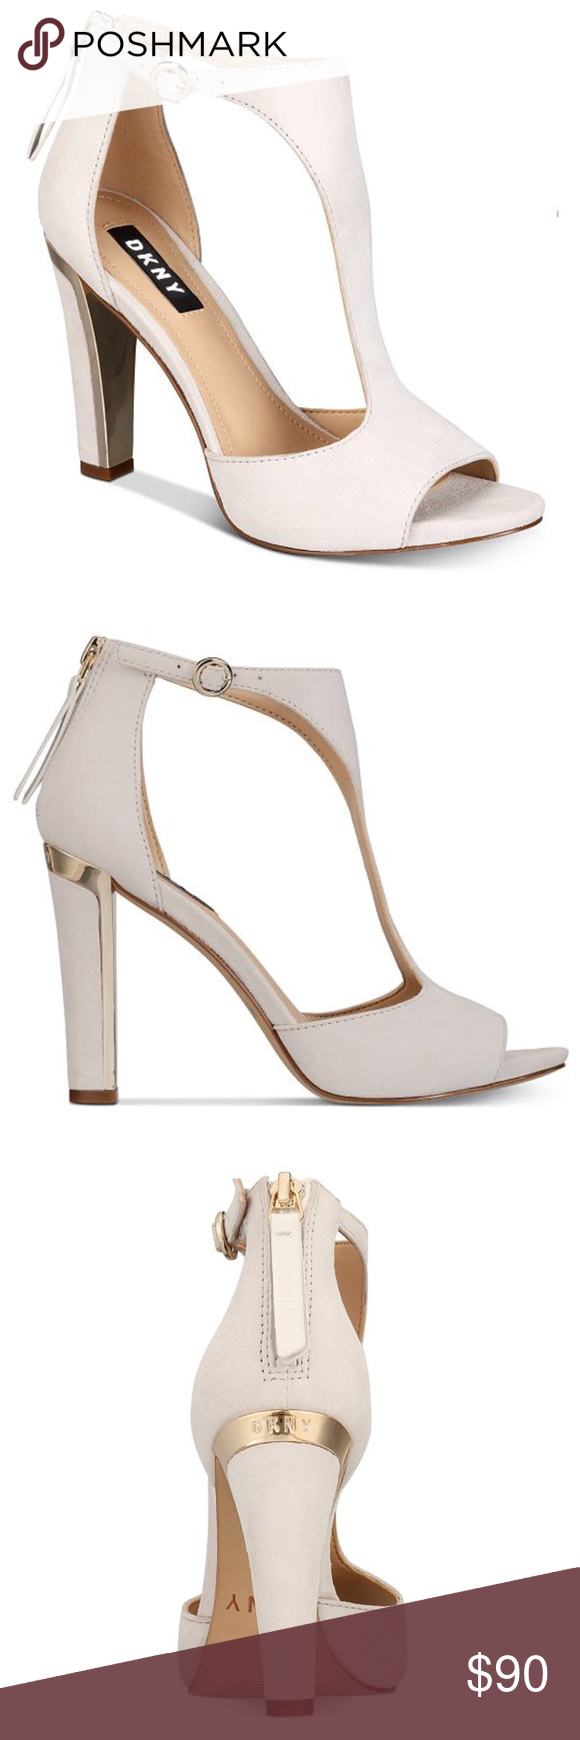 8ef0406b359 DKNY Colby T-Strap Sandals Elegant curves highlight a stylish T-strap  design on